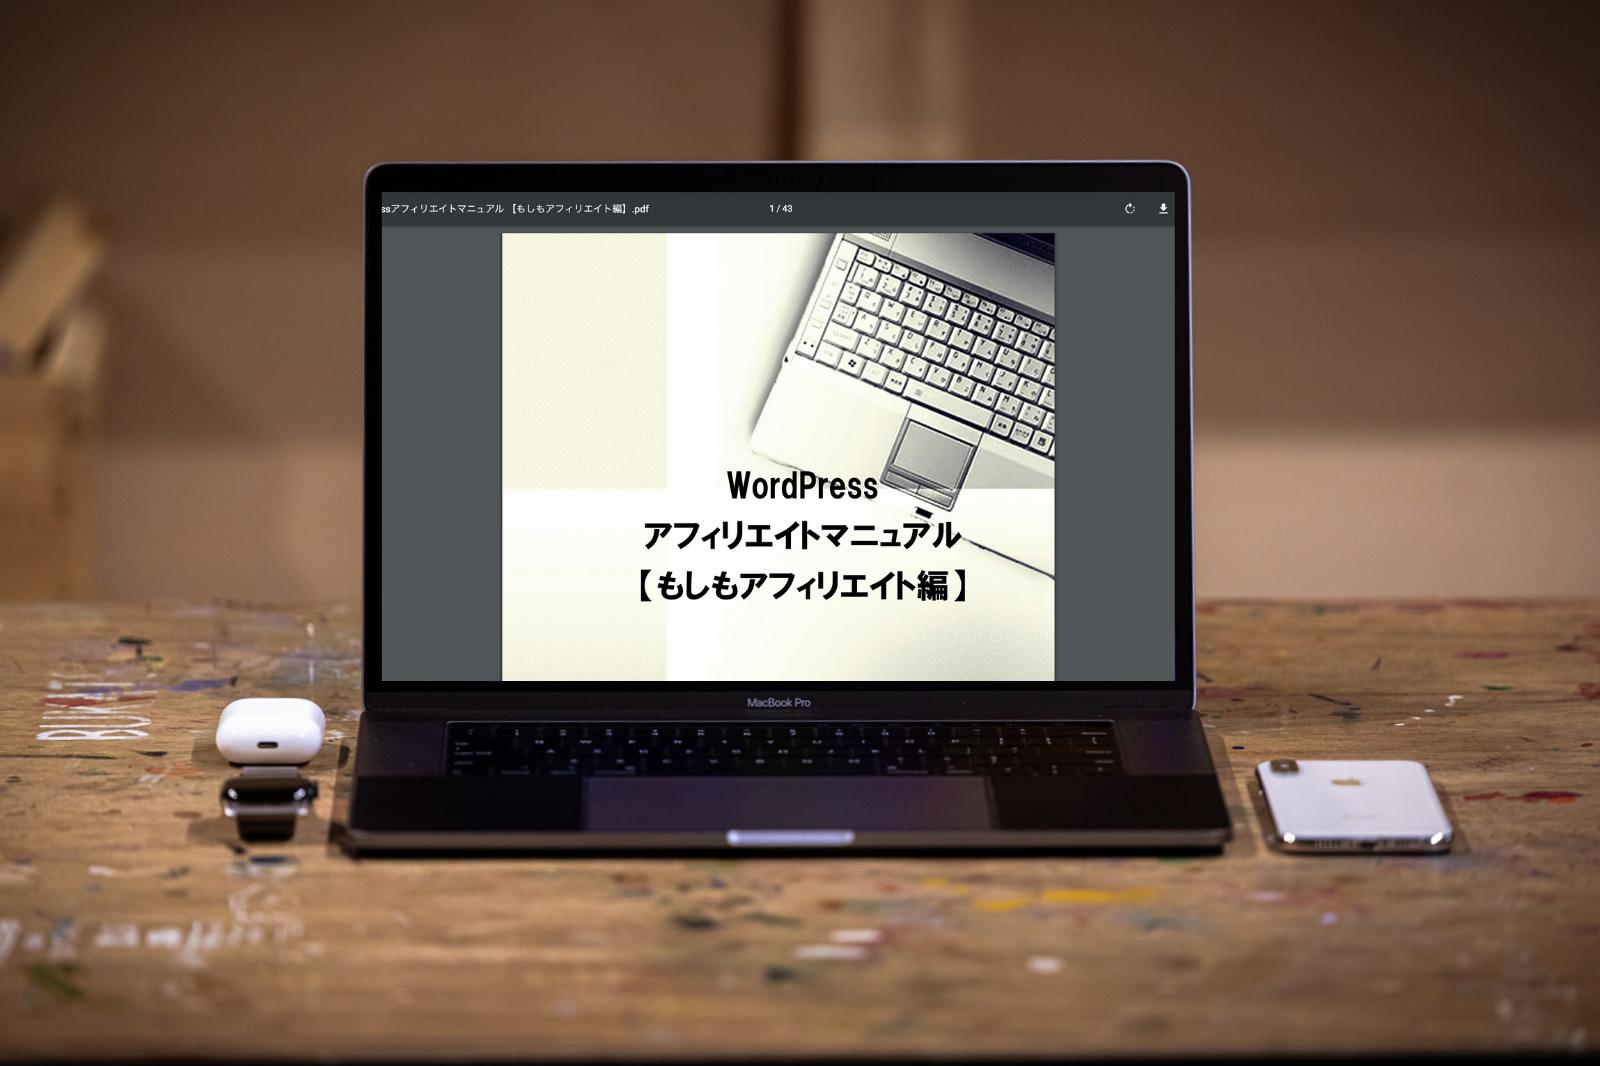 WordPressアフィリエイトマニュアル【もしもアフィリエイト編】